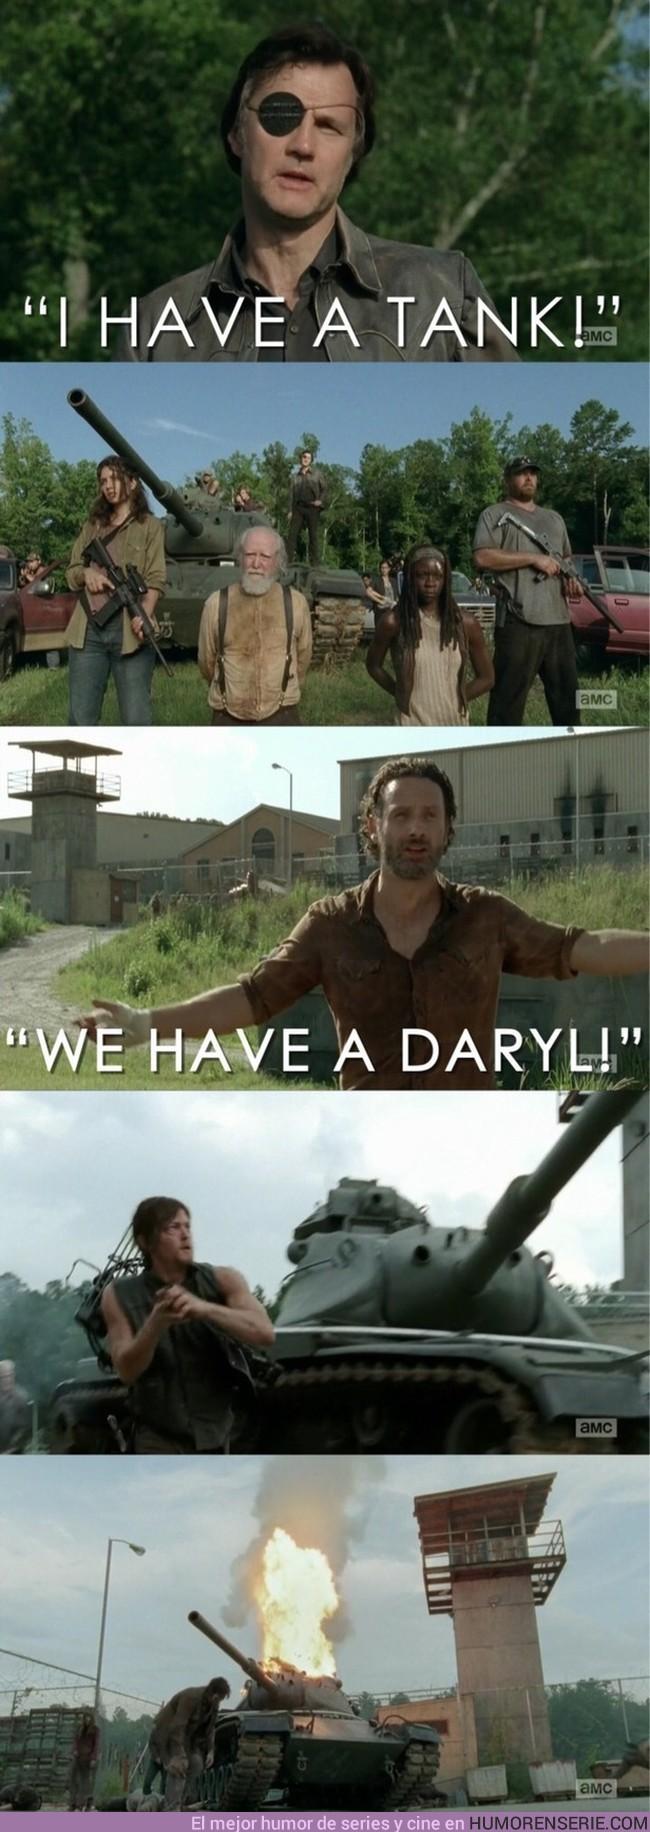 2156 - Daryl 1: Tanque 0